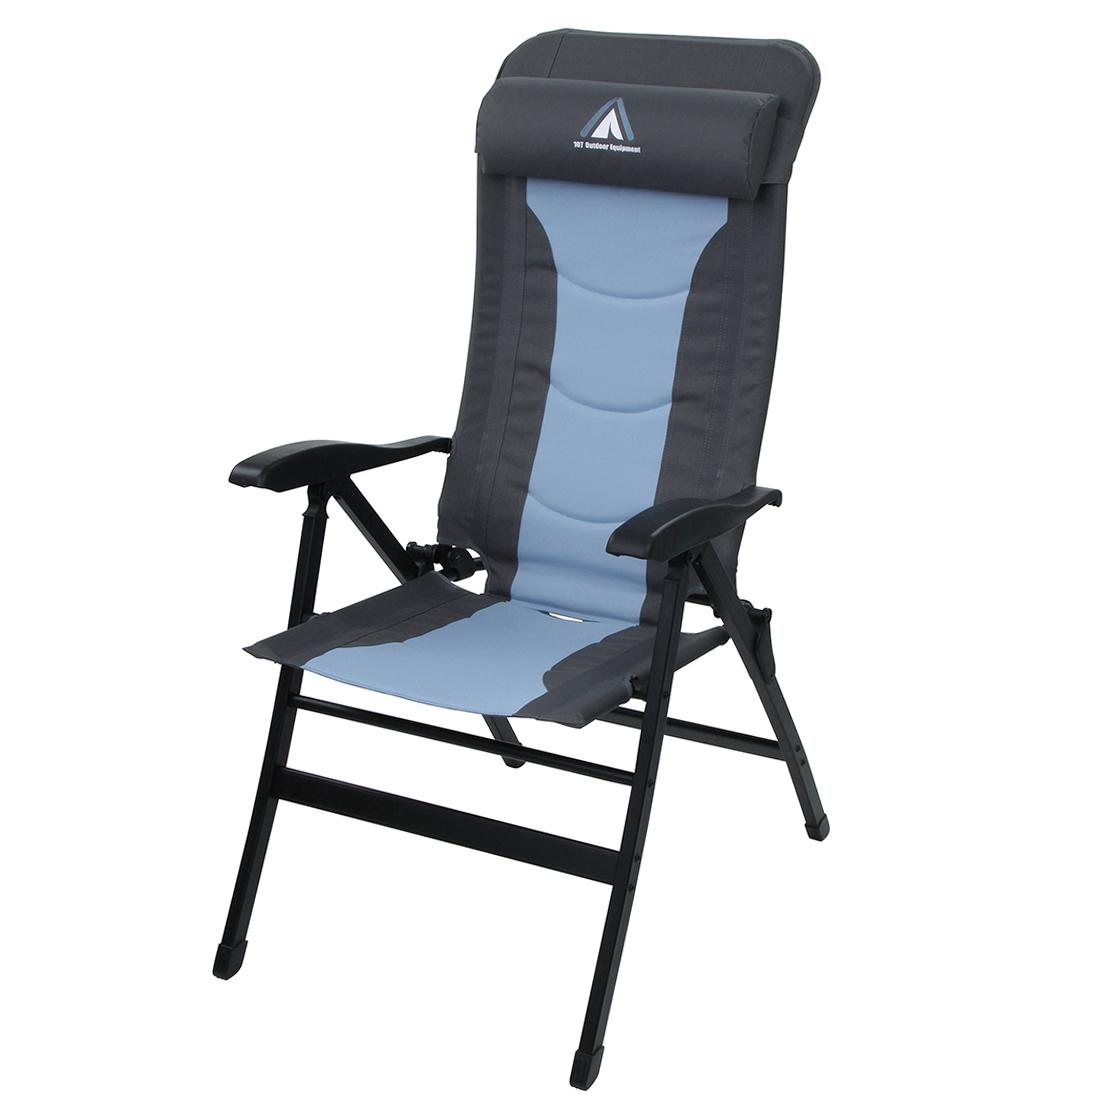 Campingstuhl Liegestuhl.10t Gartenstuhl Jai Gepolsteter Klappstuhl Campingstuhl Hochlehner Liegestuhl Stuhl Mit Kopfkissen Outdoor Furniture Chairs Folding Chairs